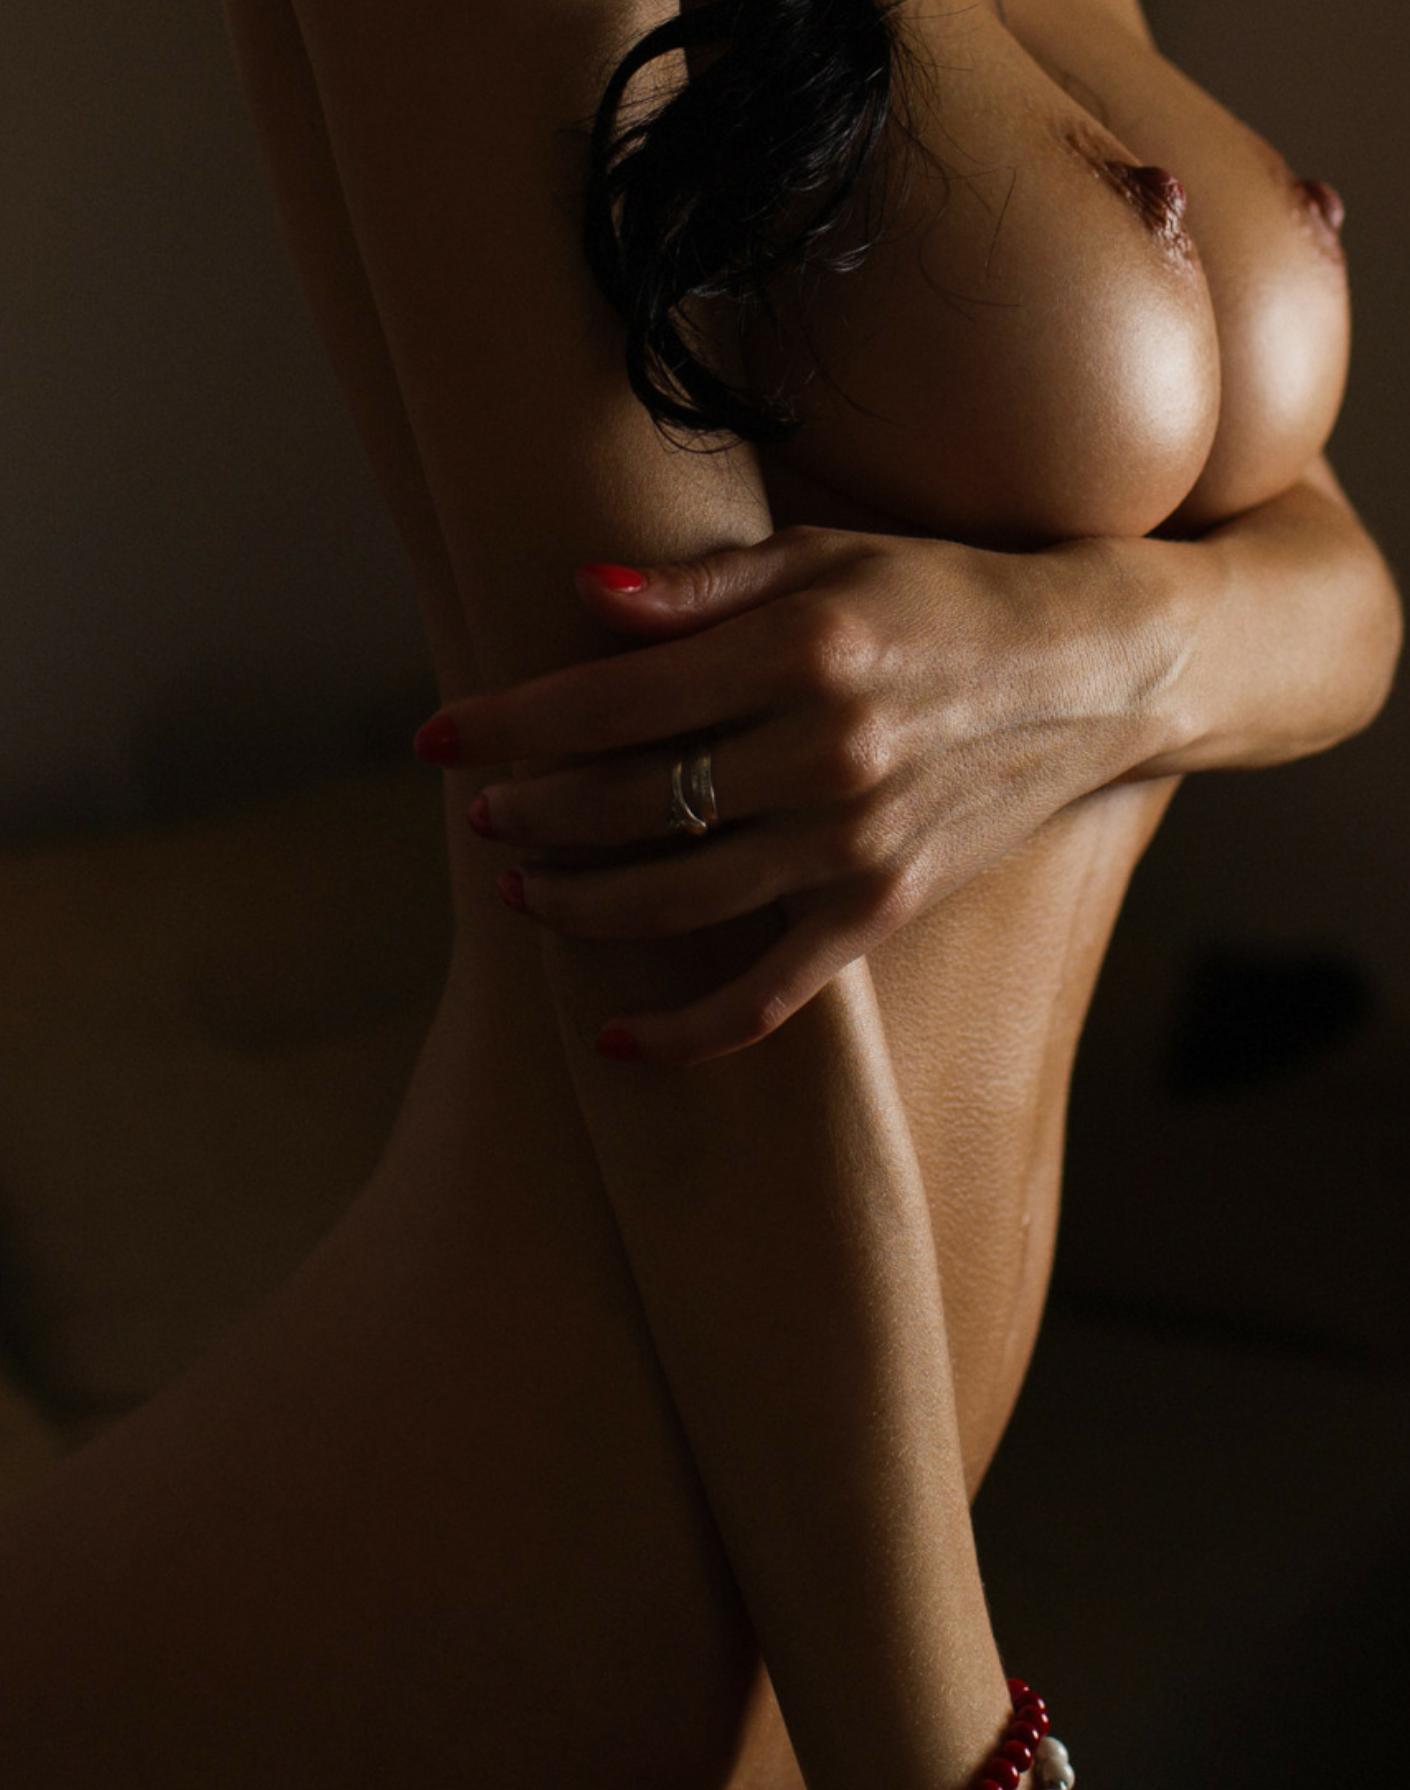 Lady gaga nude 7 Photos images